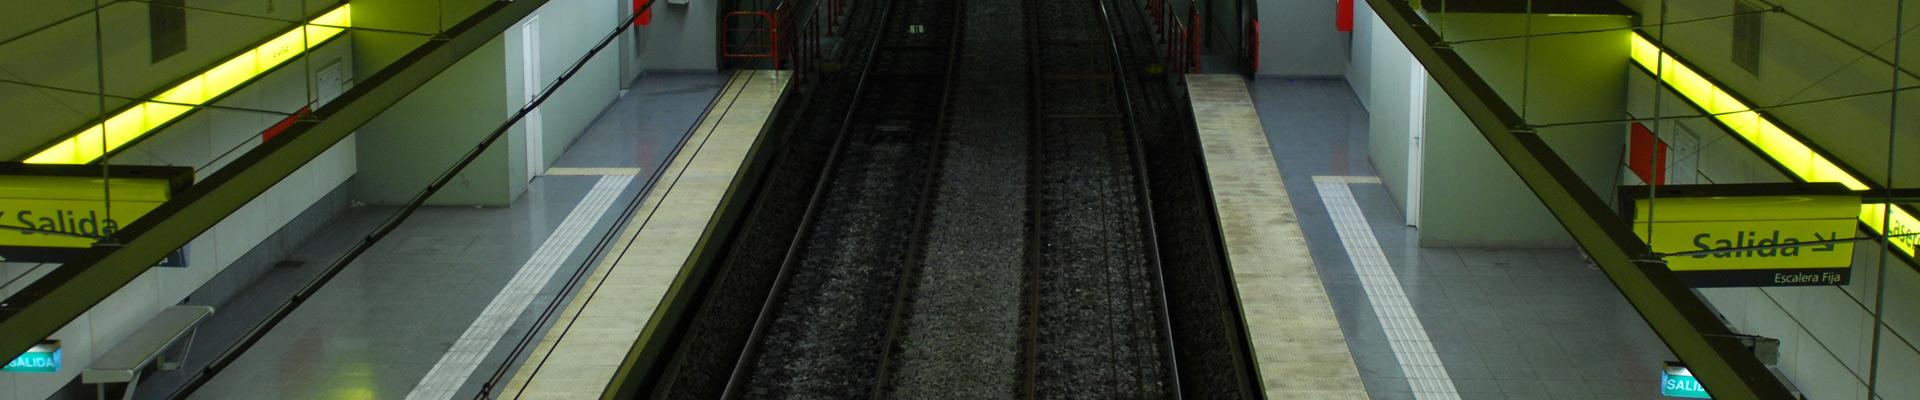 fondo-slider-2b